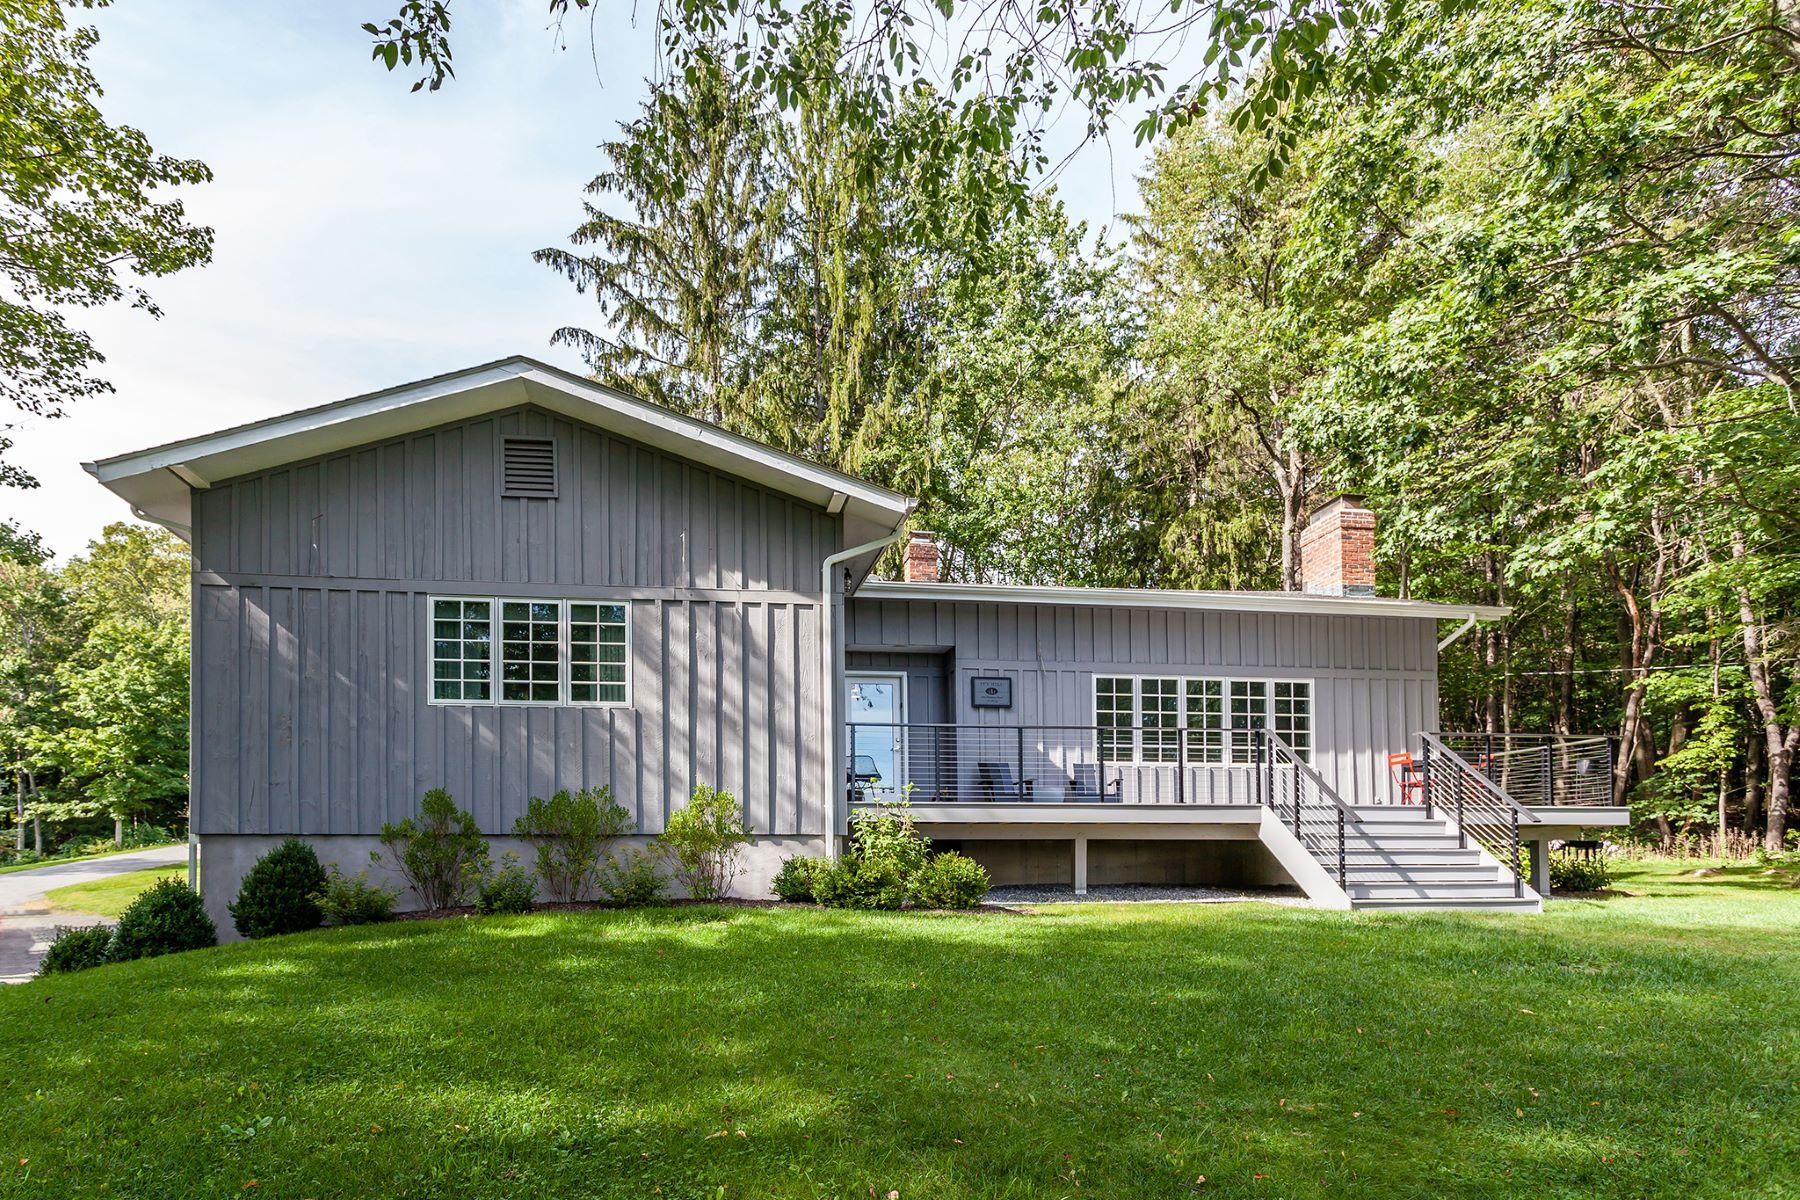 Single Family Home for Rent at Lake Waramaug Views 1 Sheehan Road Warren, Connecticut, 06777 United States